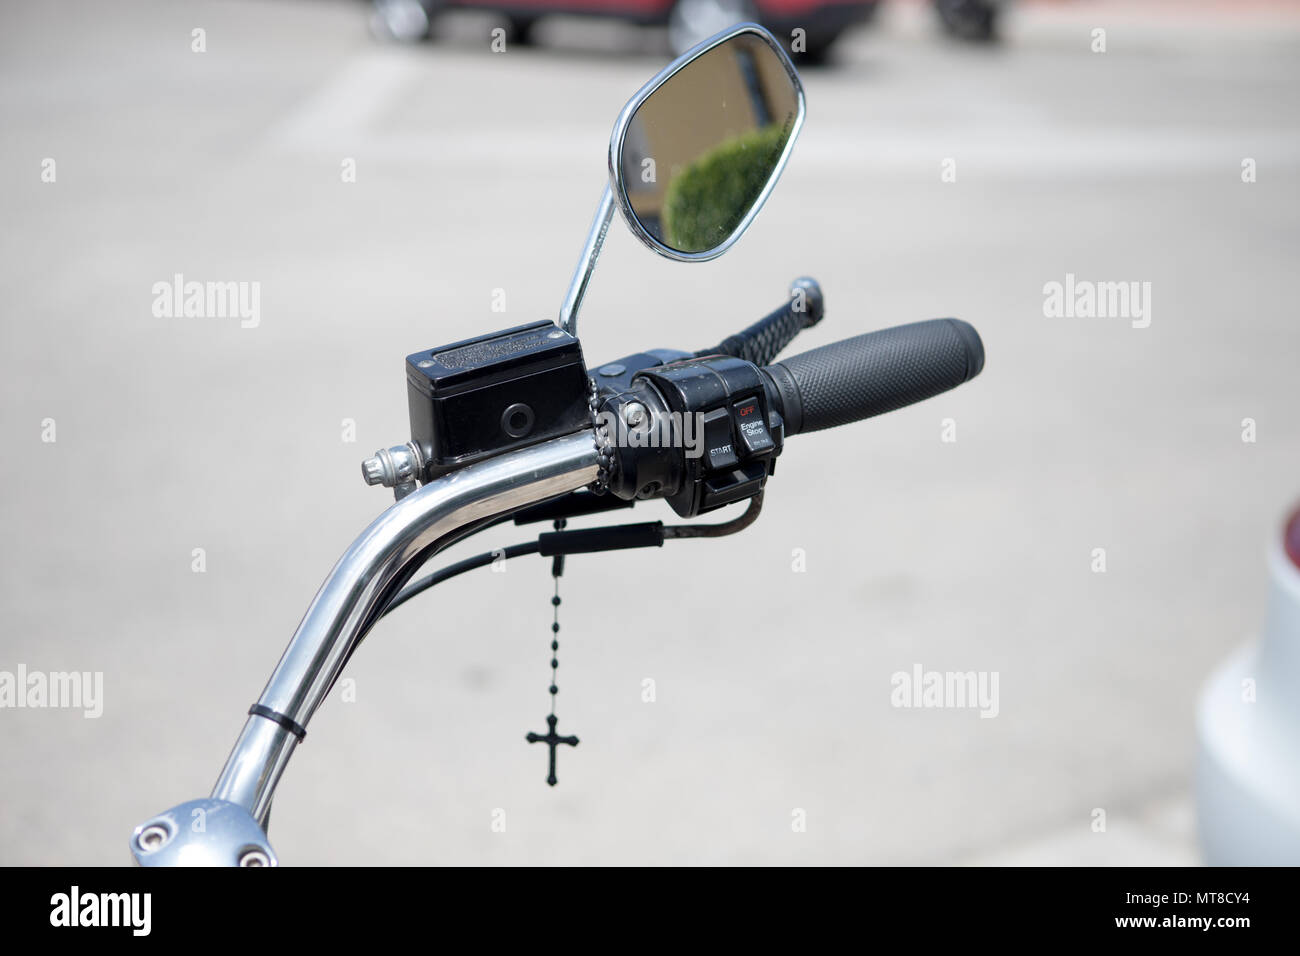 Harley Davidson Handlebars High Resolution Stock Photography And Images Alamy